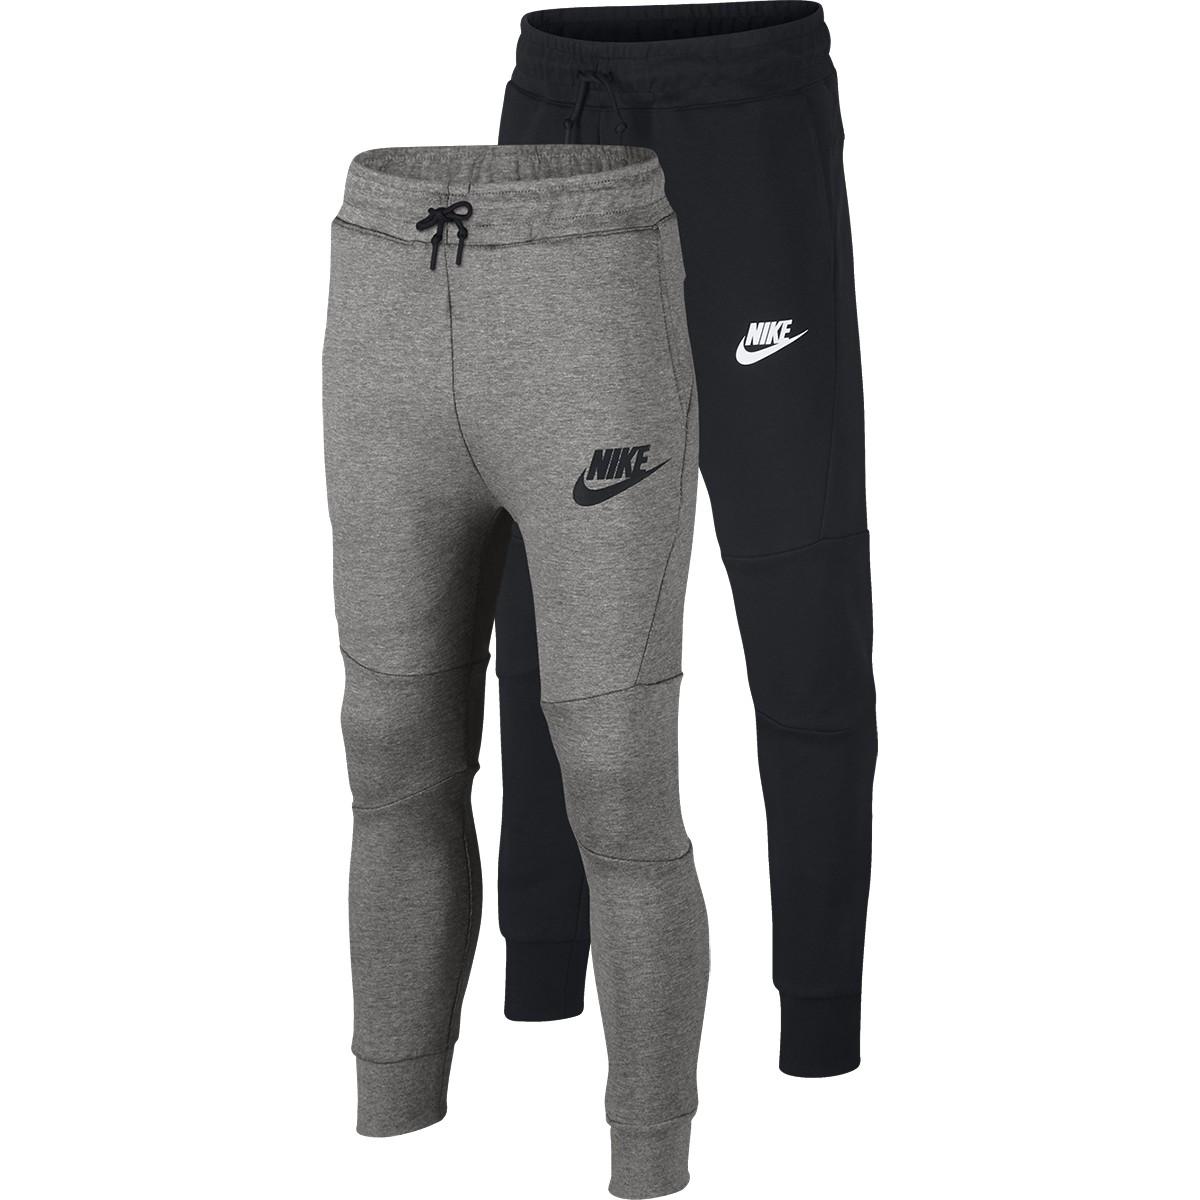 Activewear Bottoms Nike Tech Pants Elegant In Style